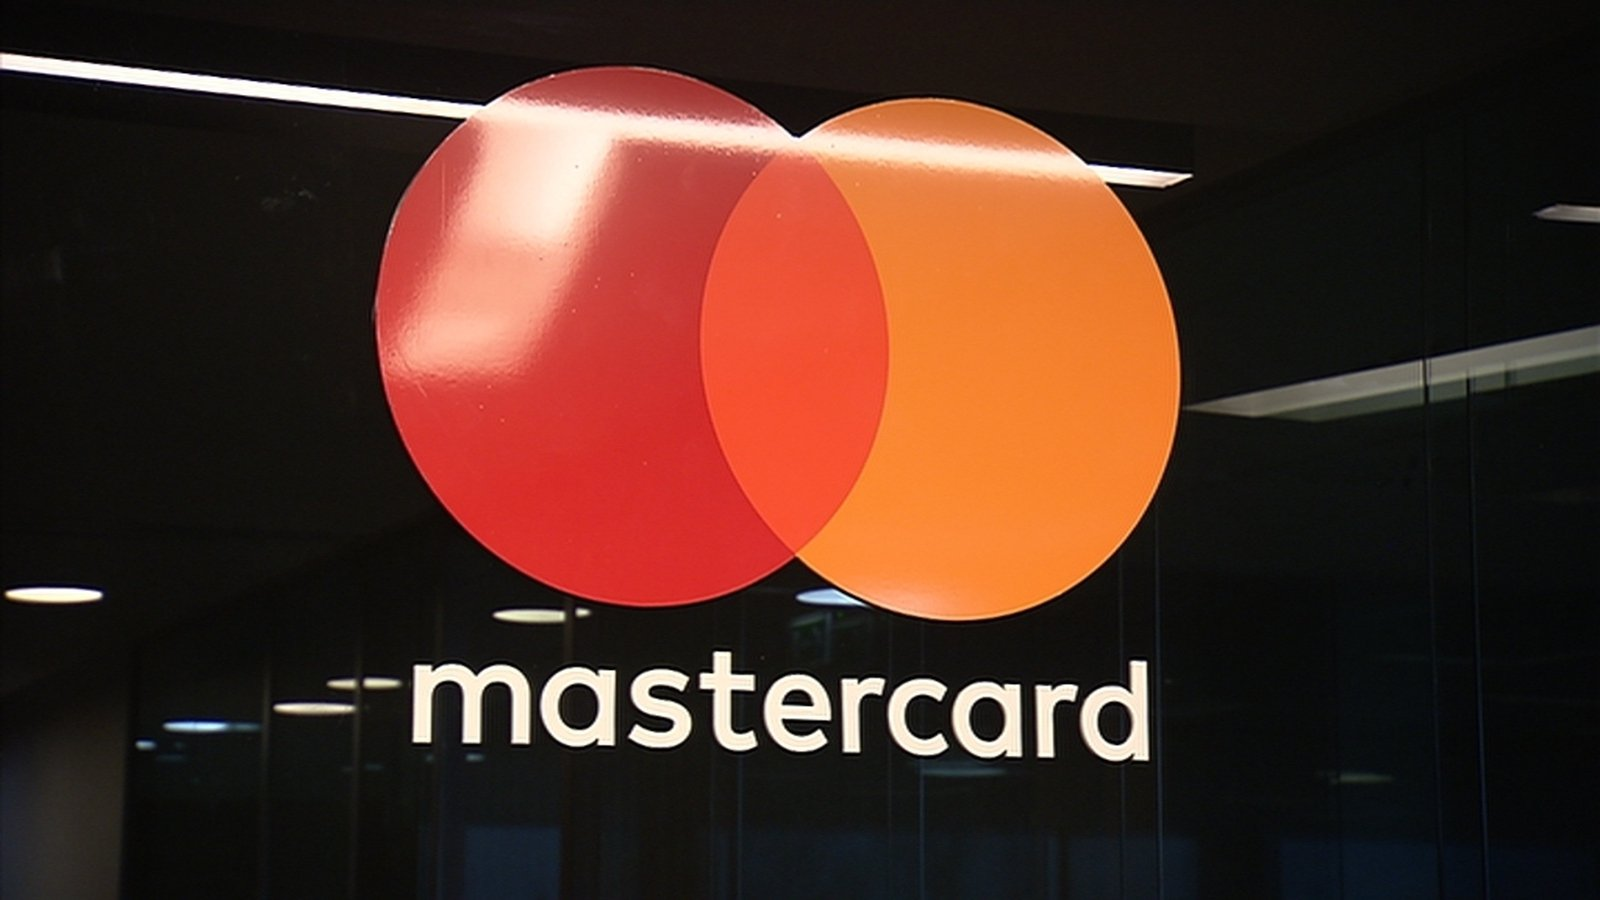 Mastercard to create 1,500 jobs in Dublin